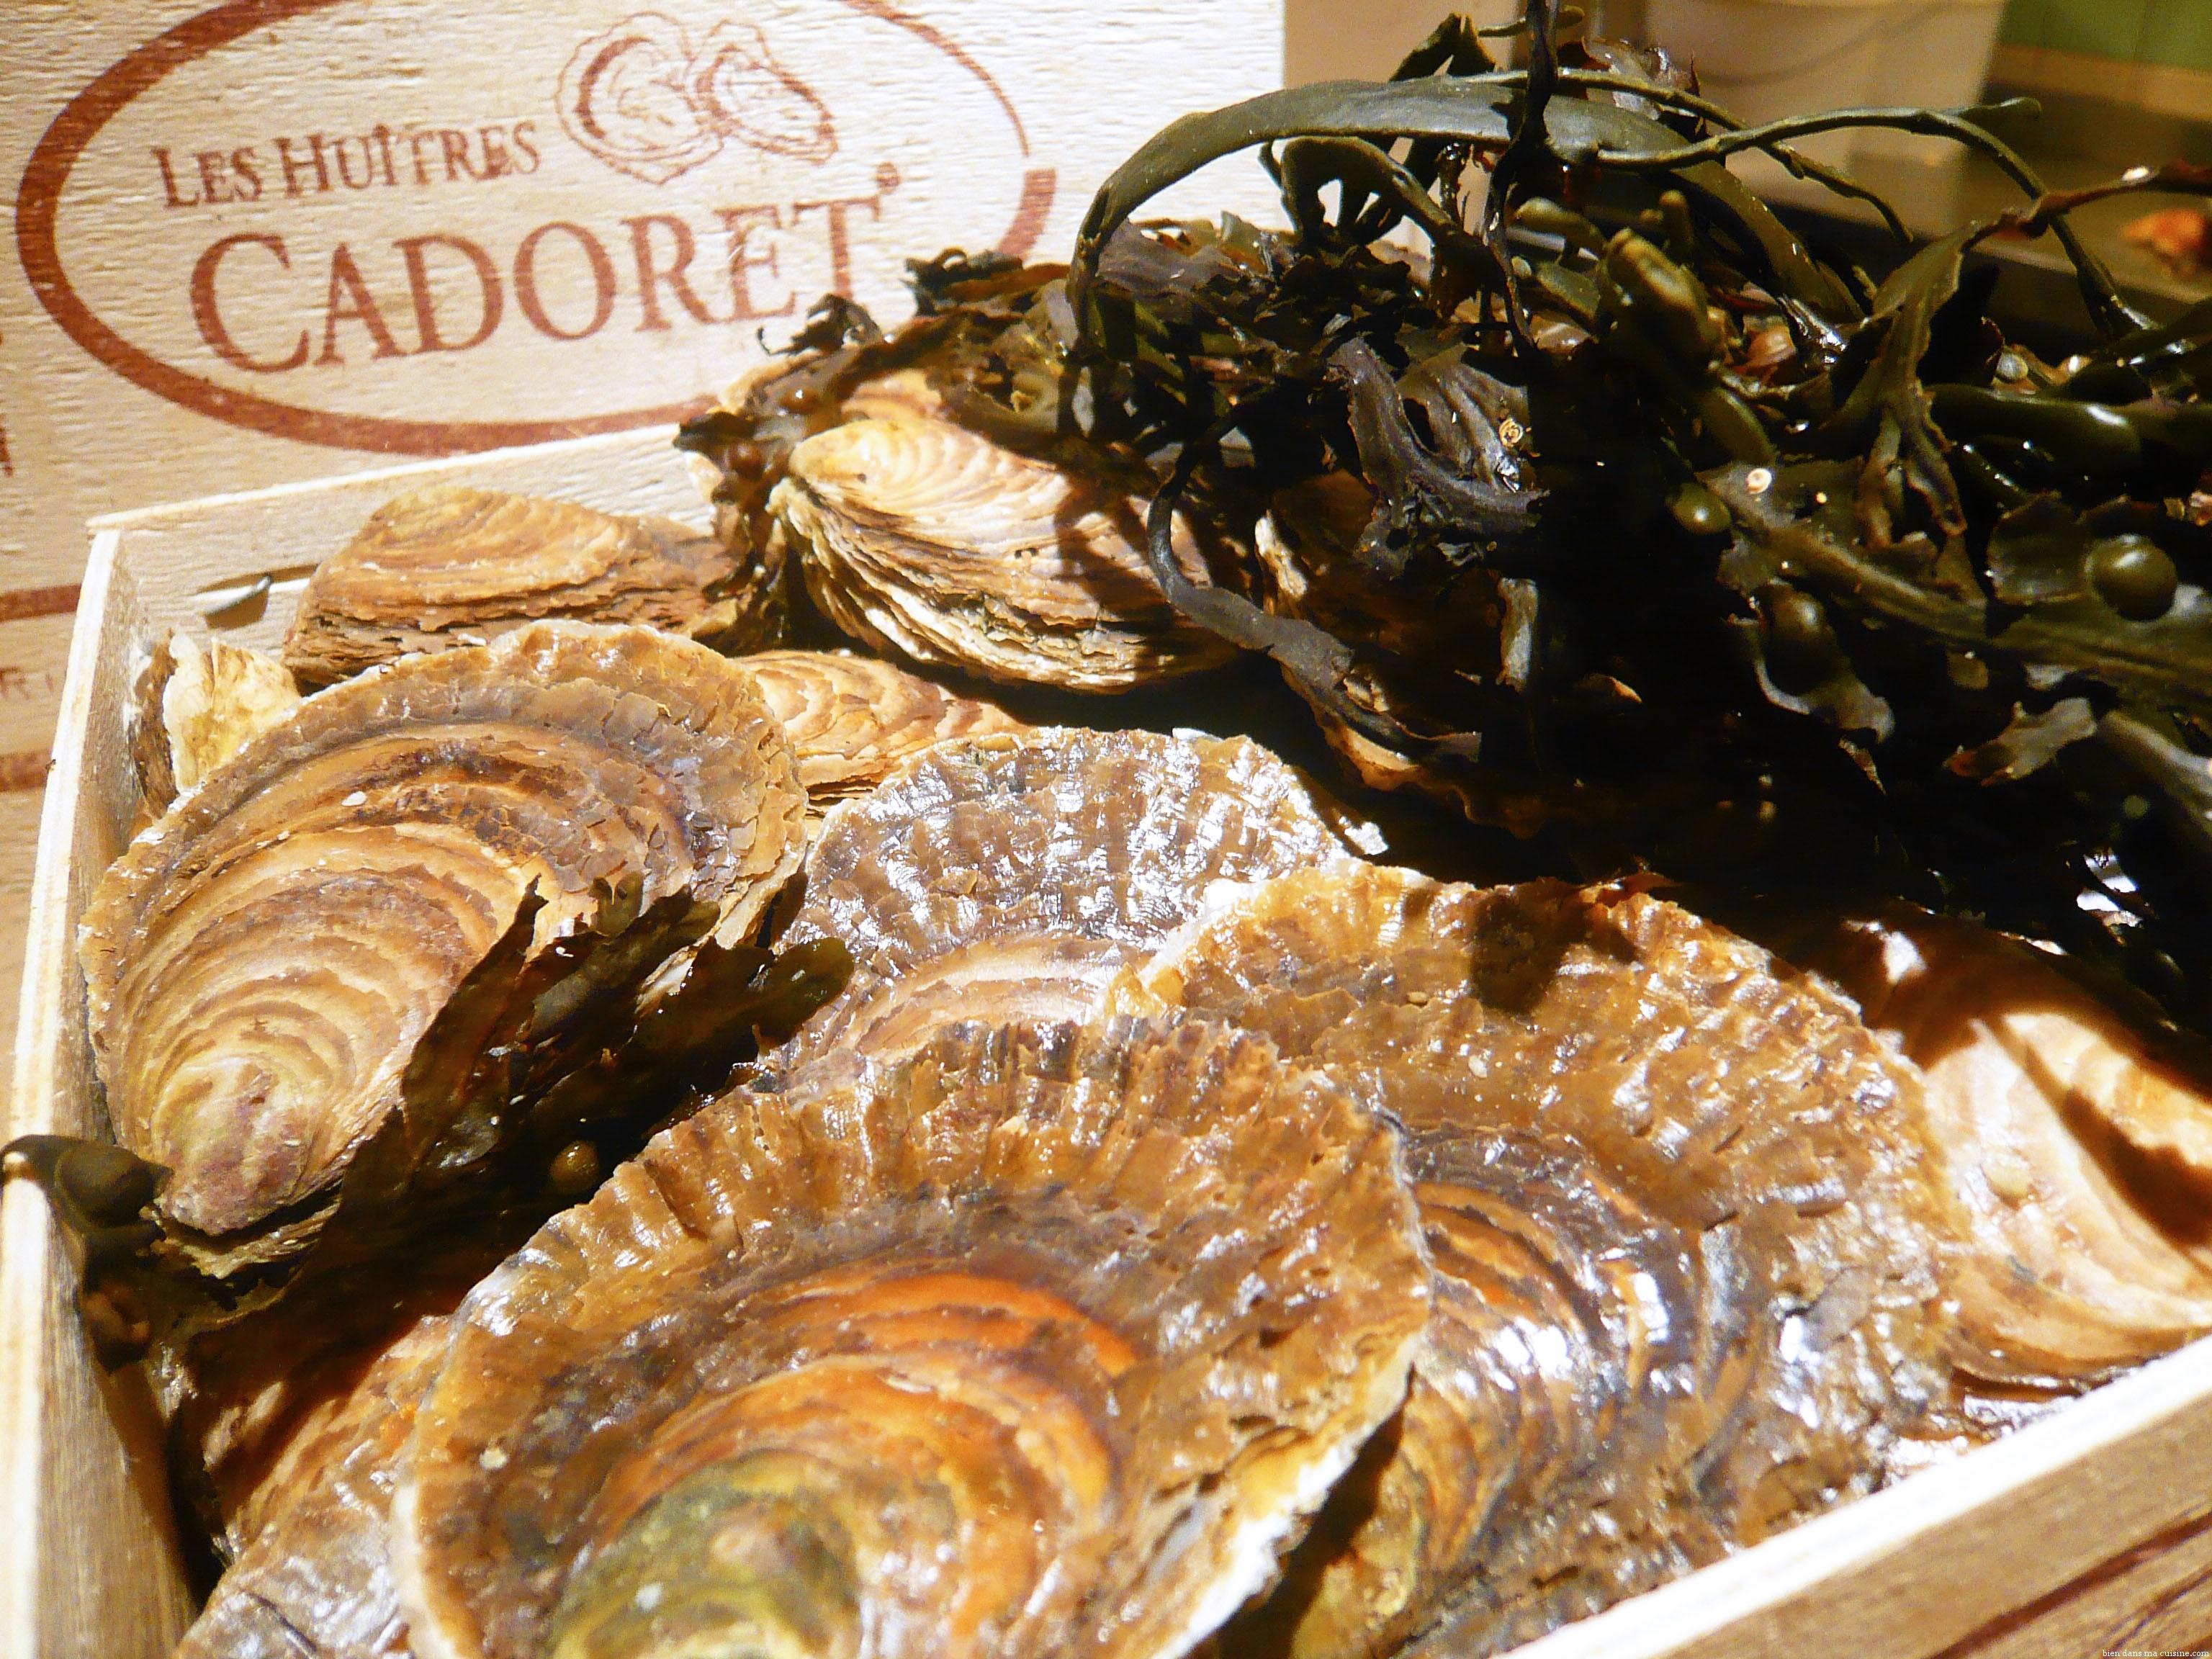 Les fameuses huîtres Cadoret.